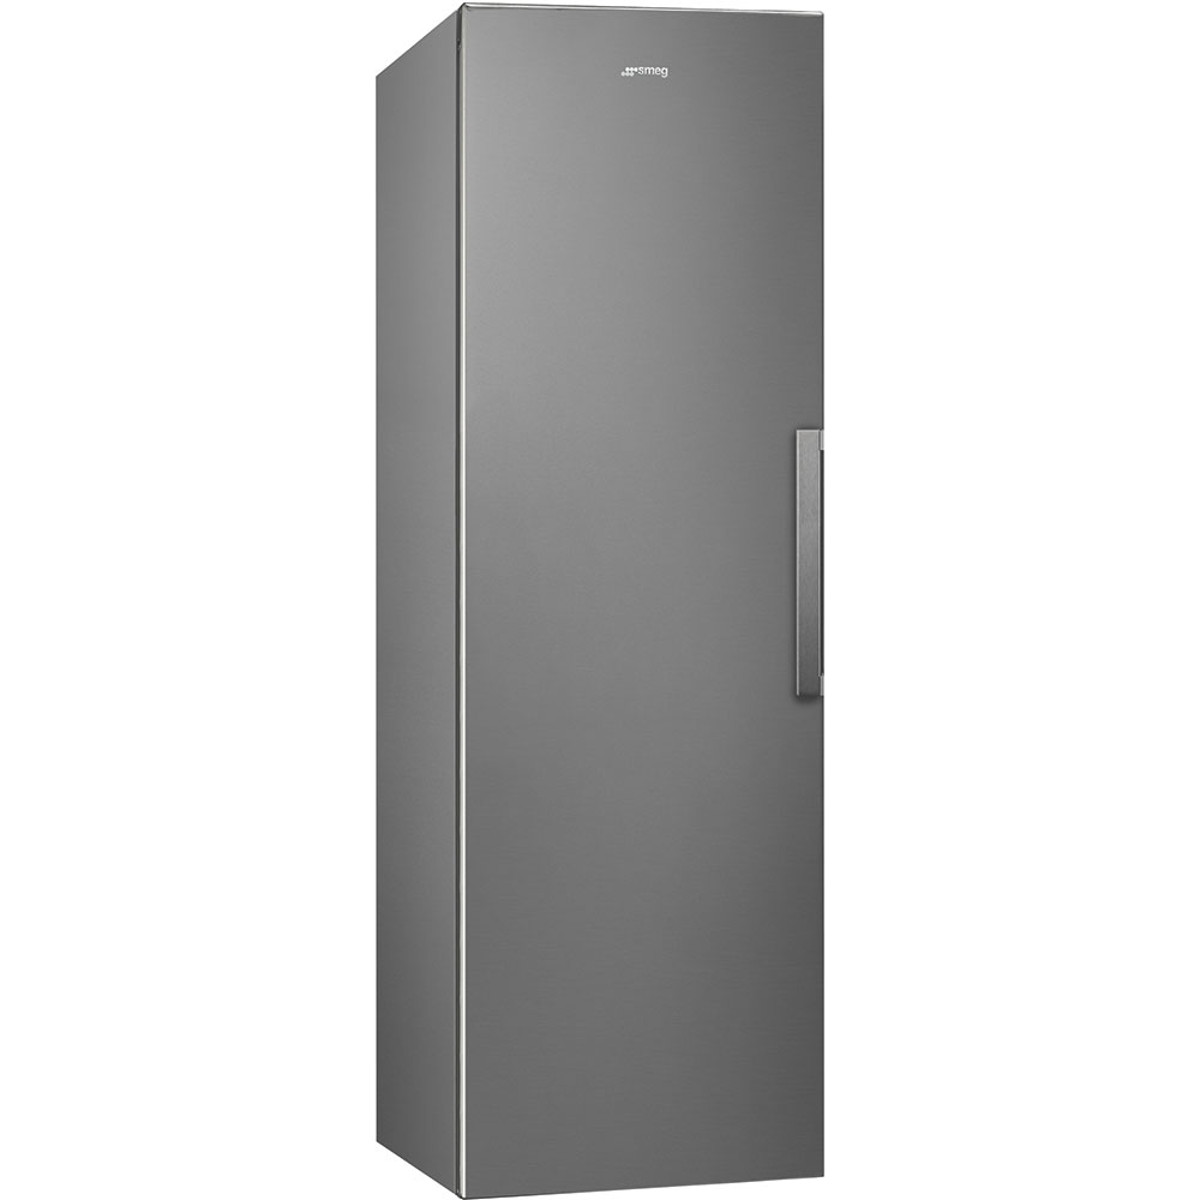 Smeg UK26PXNF4 Freestanding Freezer